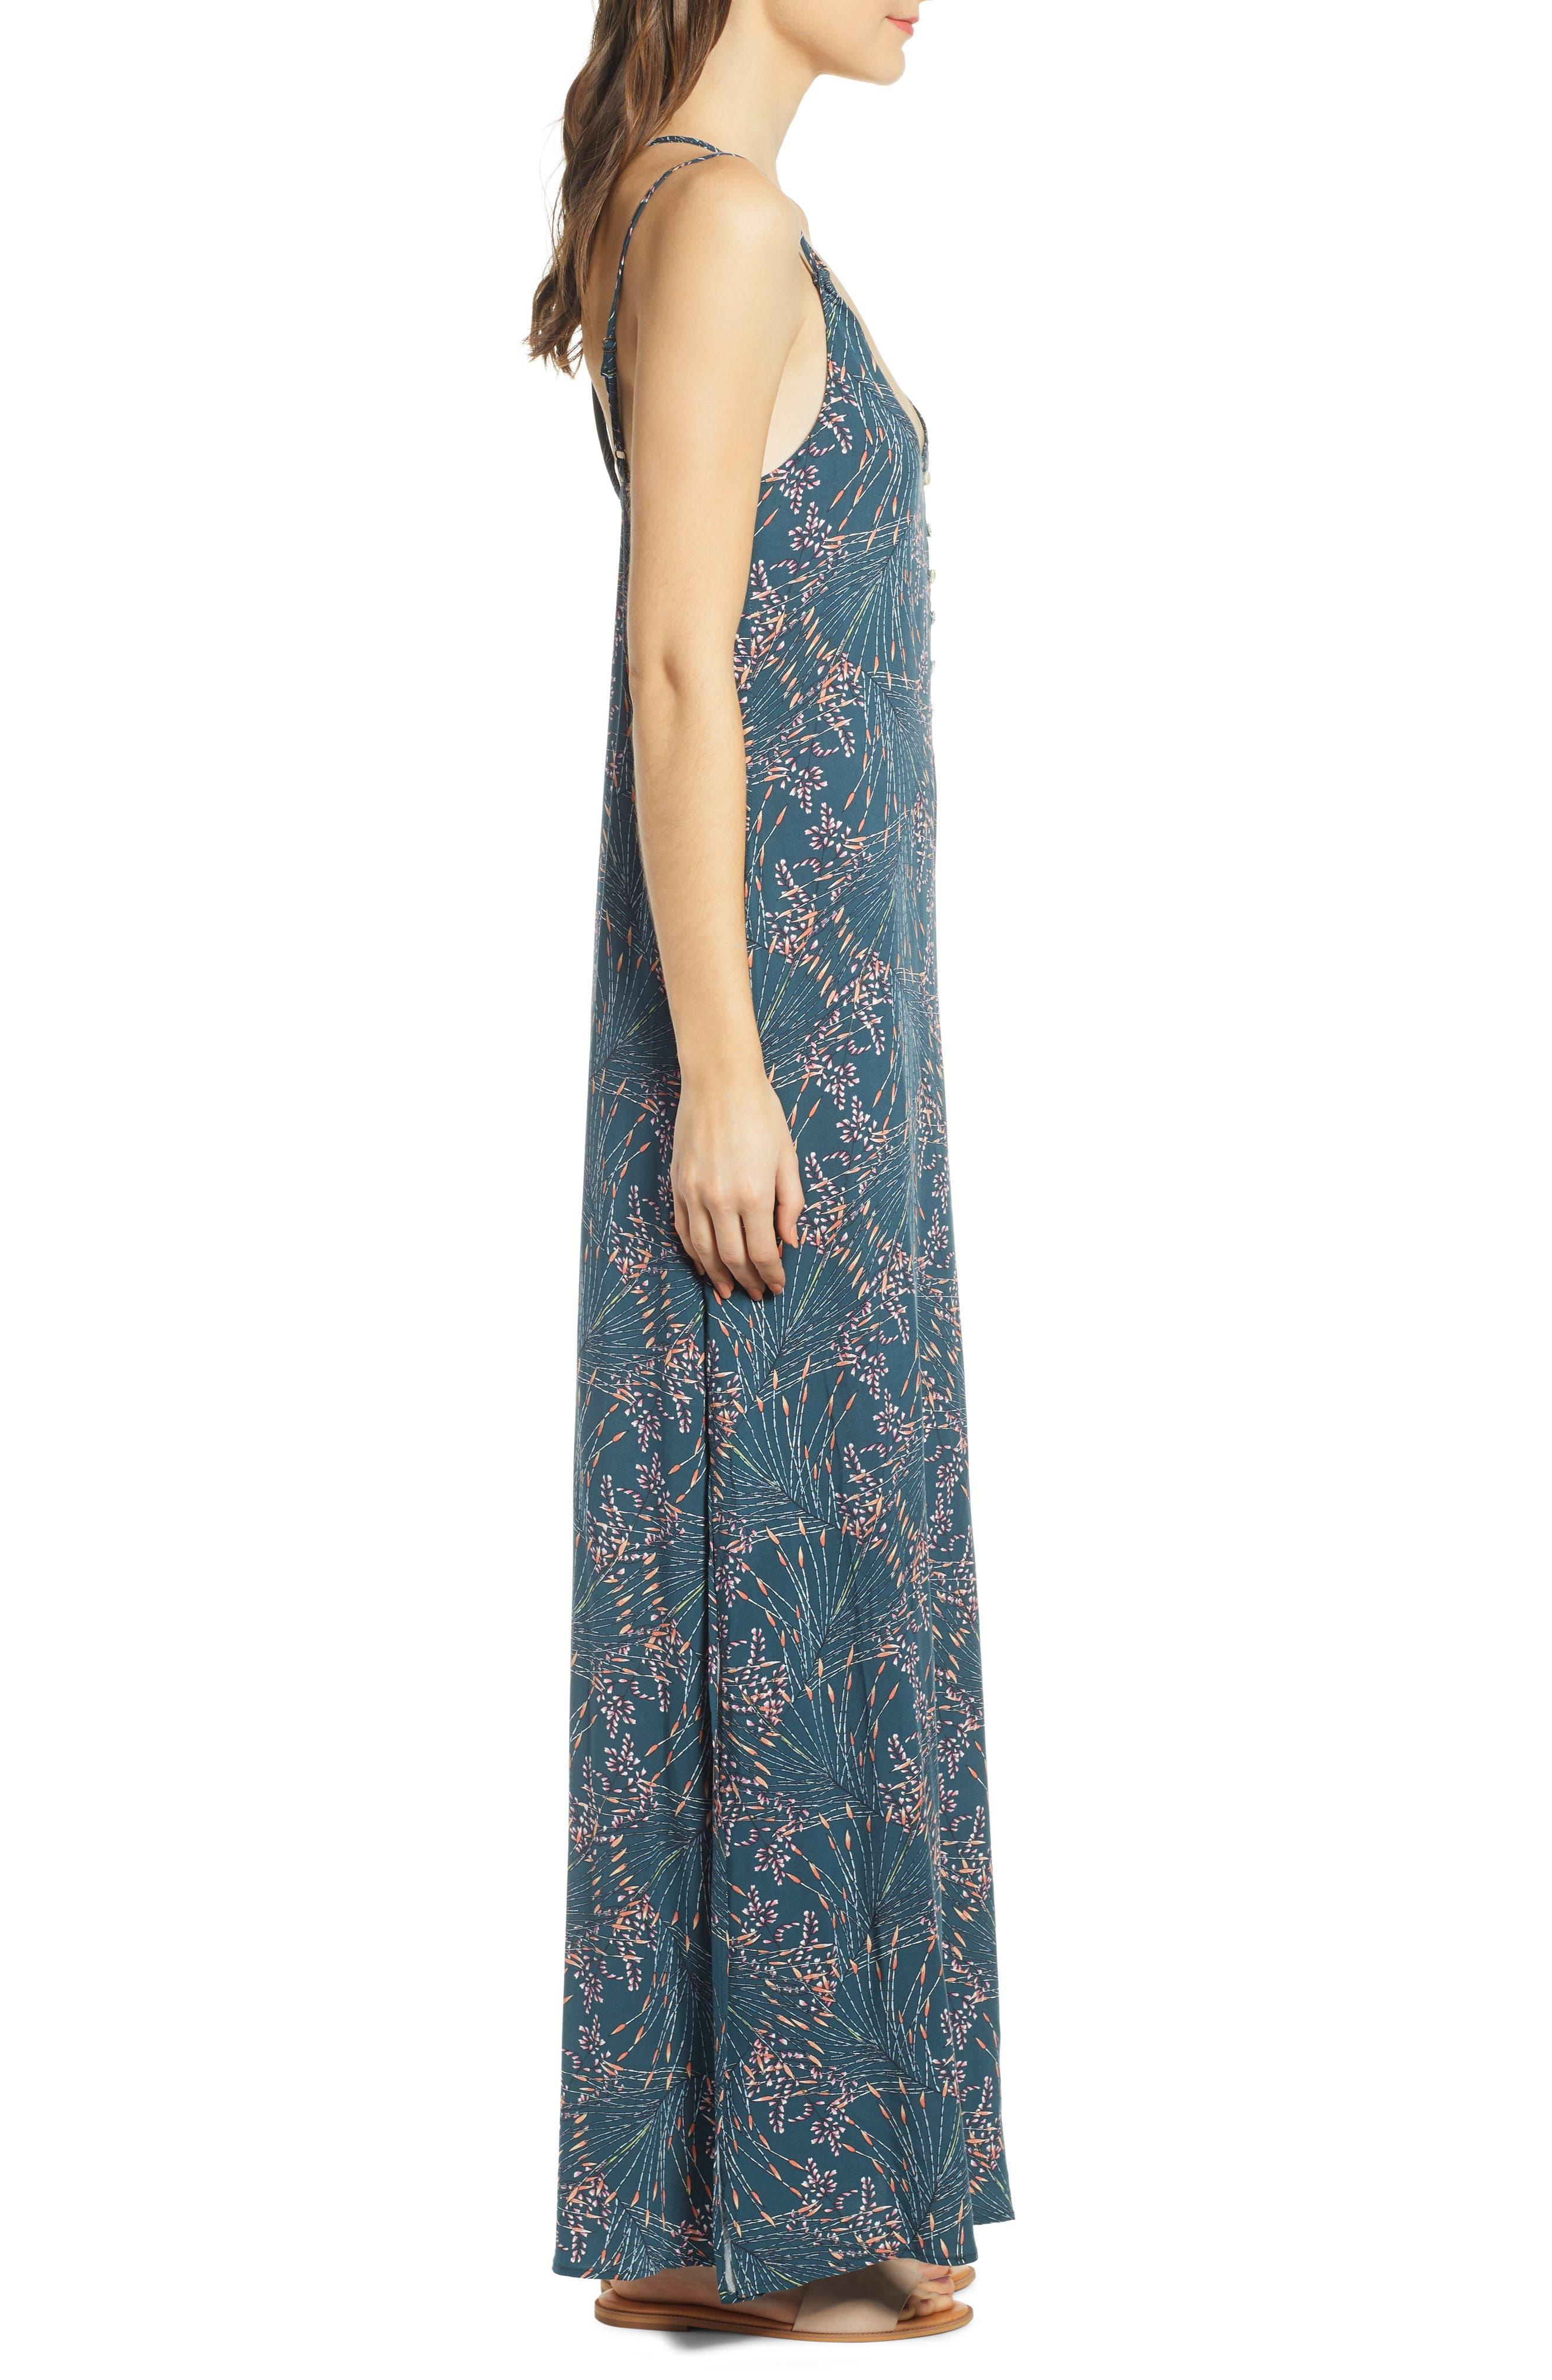 O'NEILL,                             Breanna Maxi Dress,                             Alternate thumbnail 3, color,                             STARGAZER